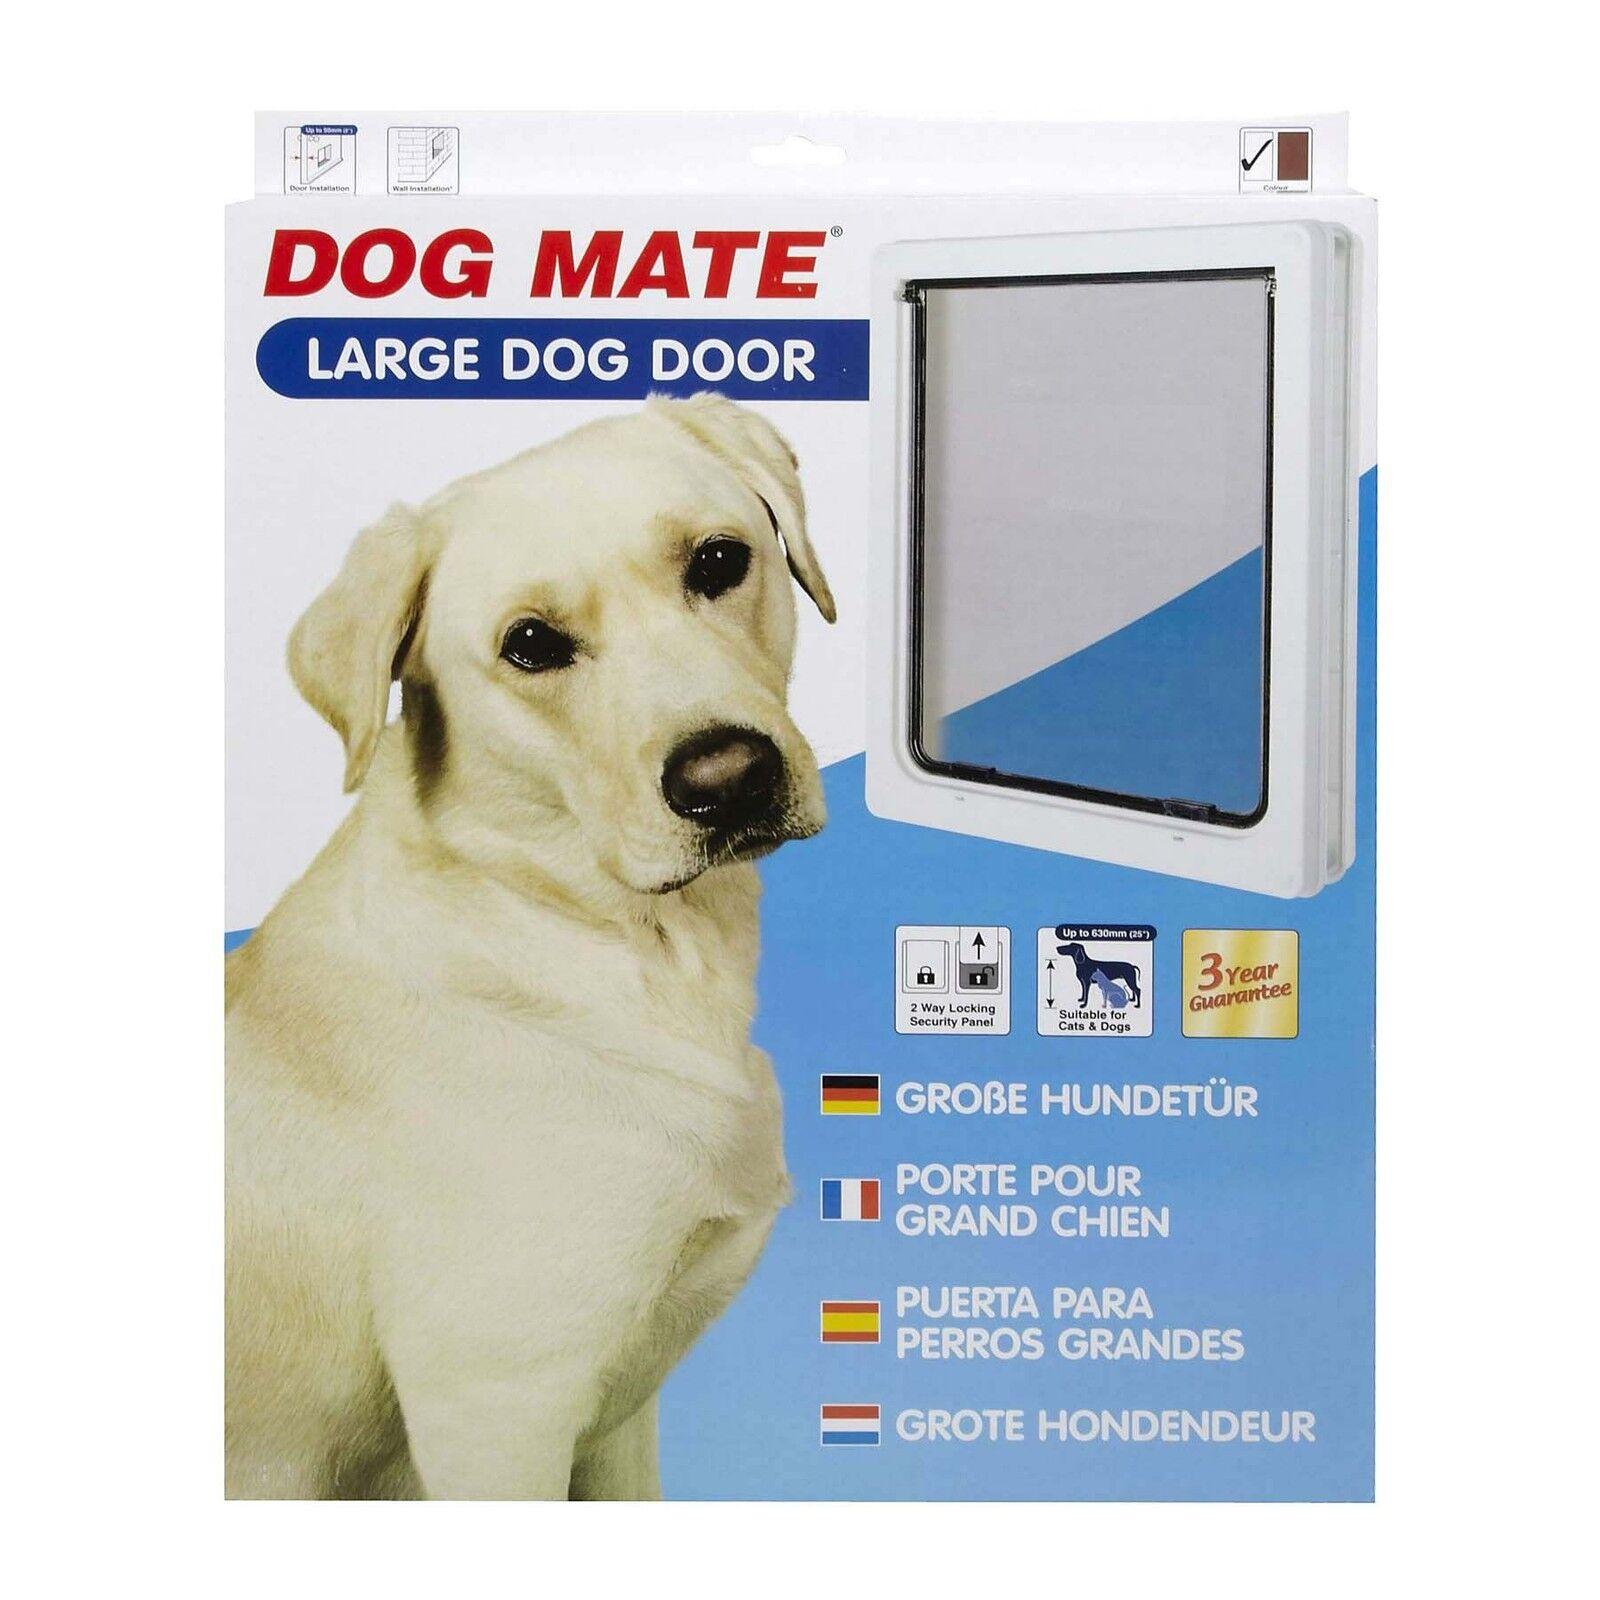 DOG Mate PET DOG DOOR Flap CANI GRANDI BIANCO 216 216W Flap dimensioni 34,5 x 29,5 cm